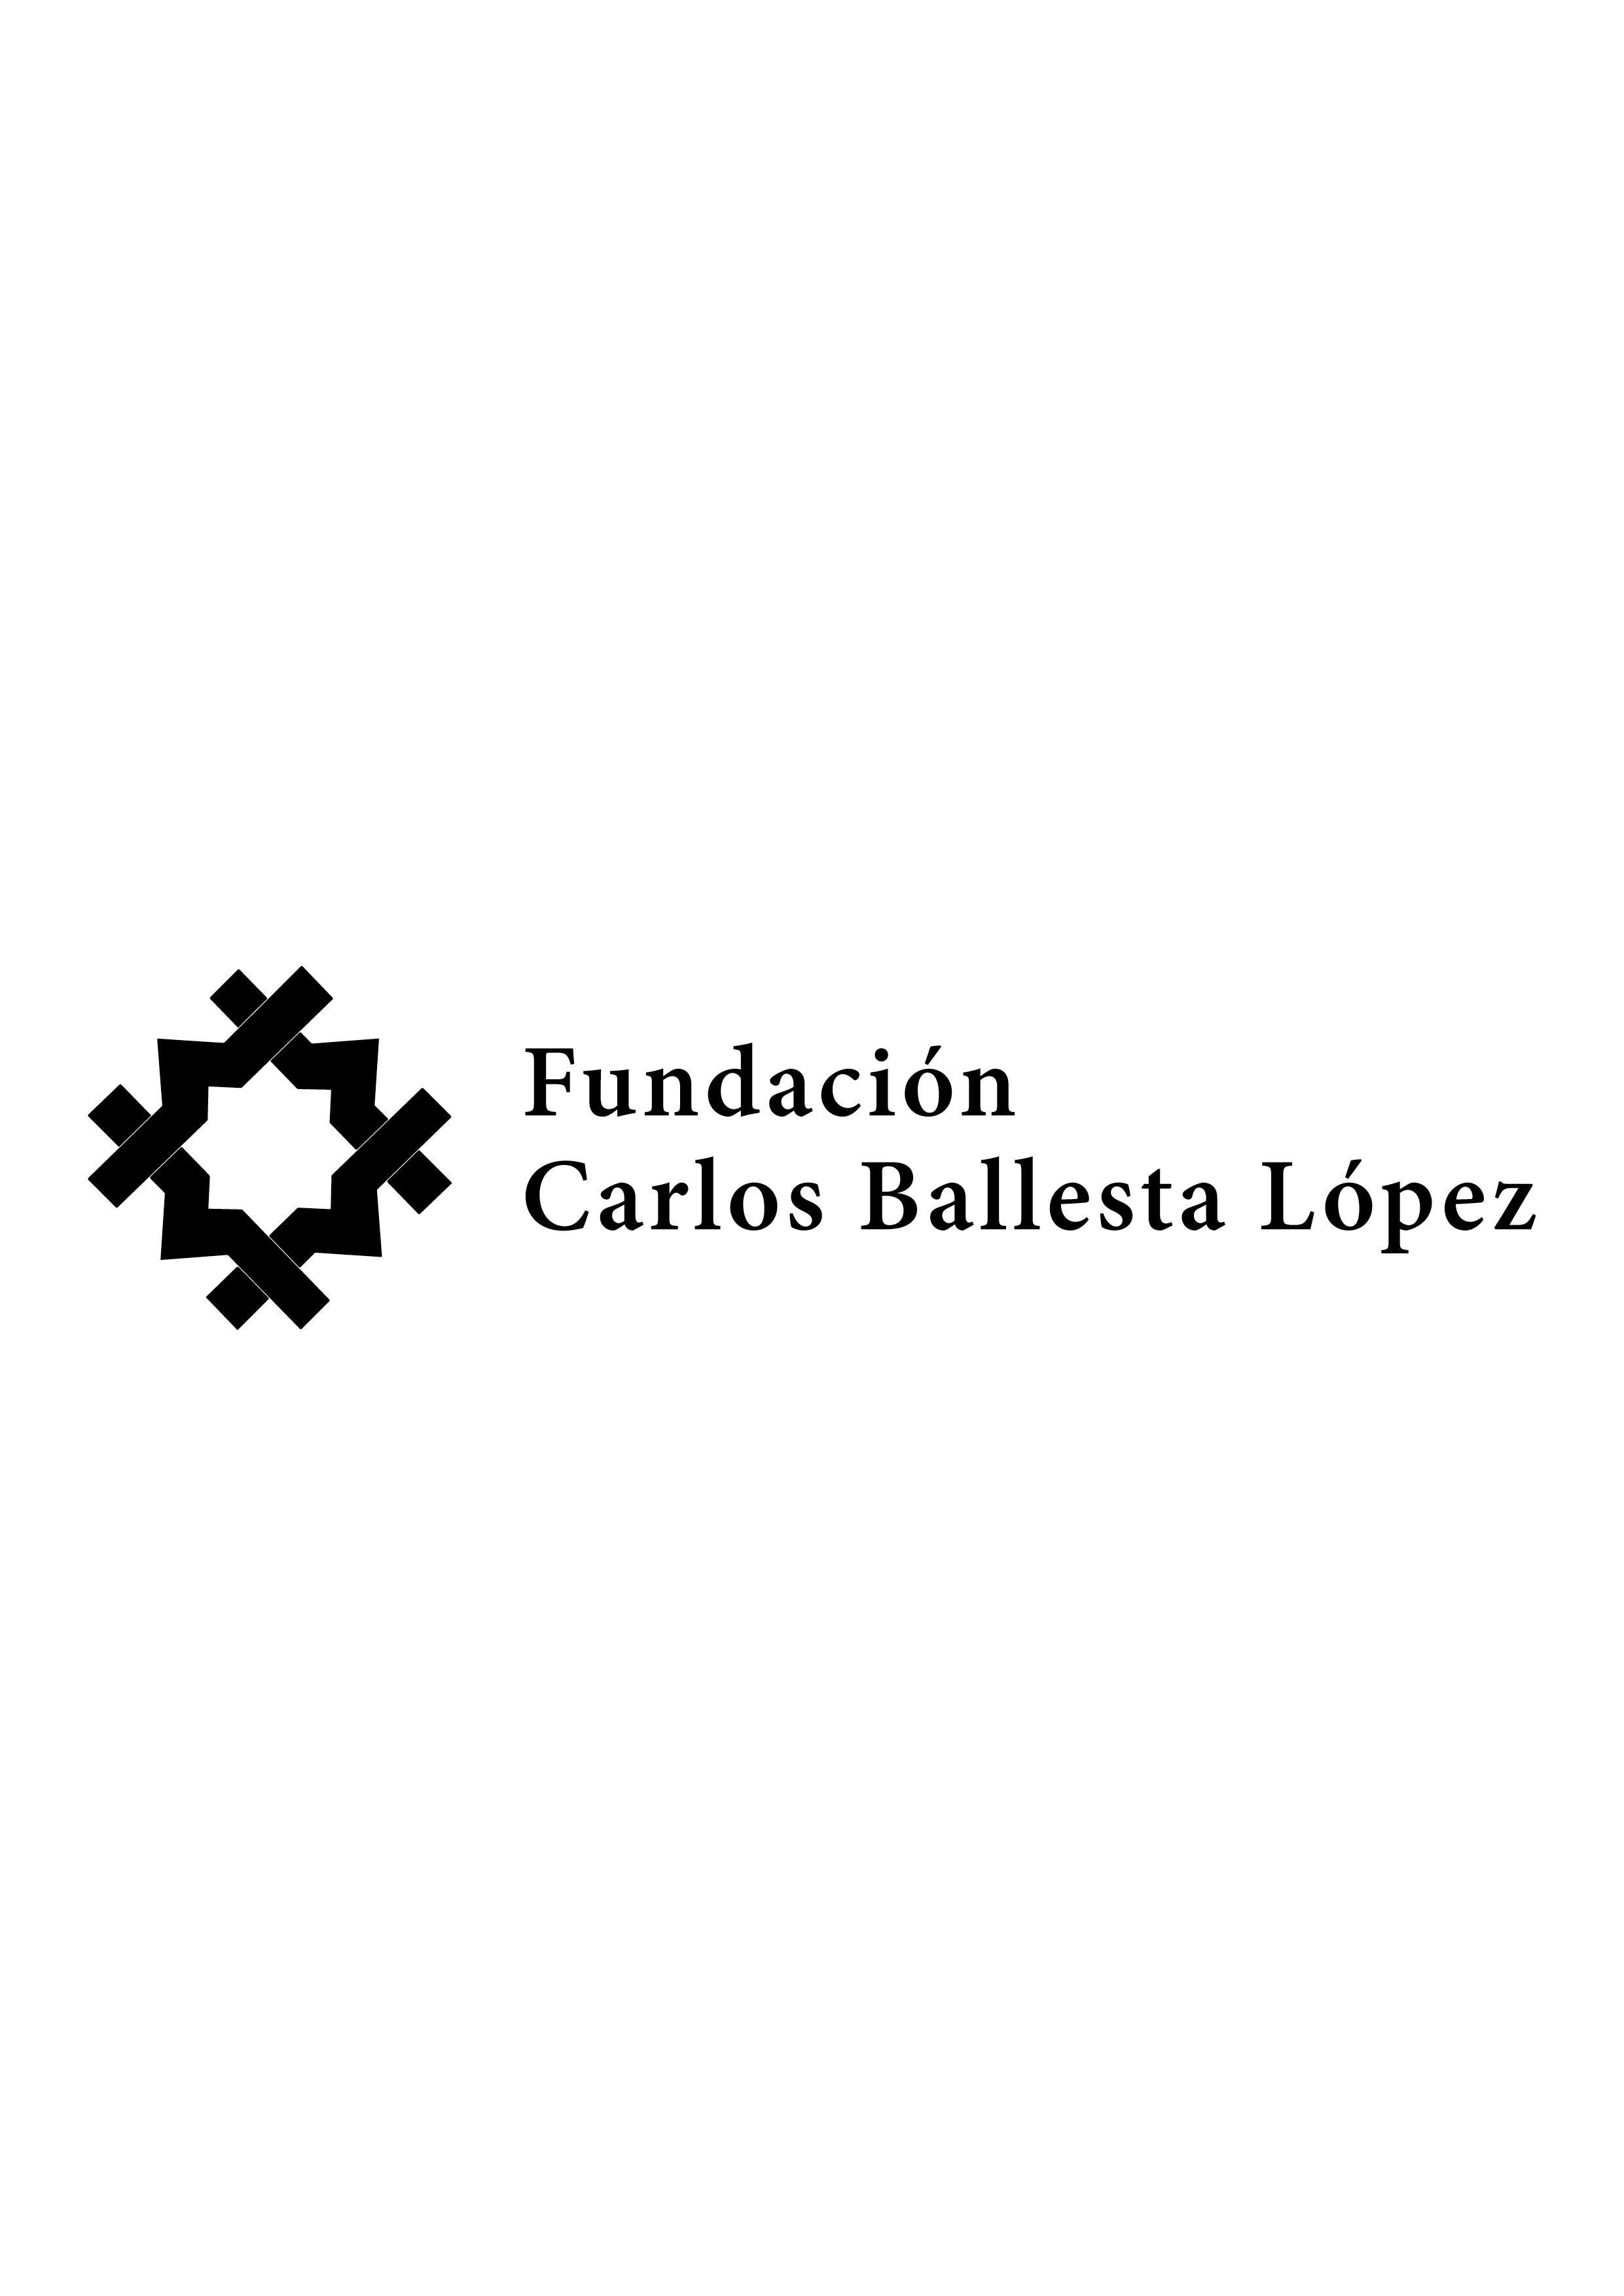 FUNDACIÓN CARLOS BALLESTA LÓPEZ